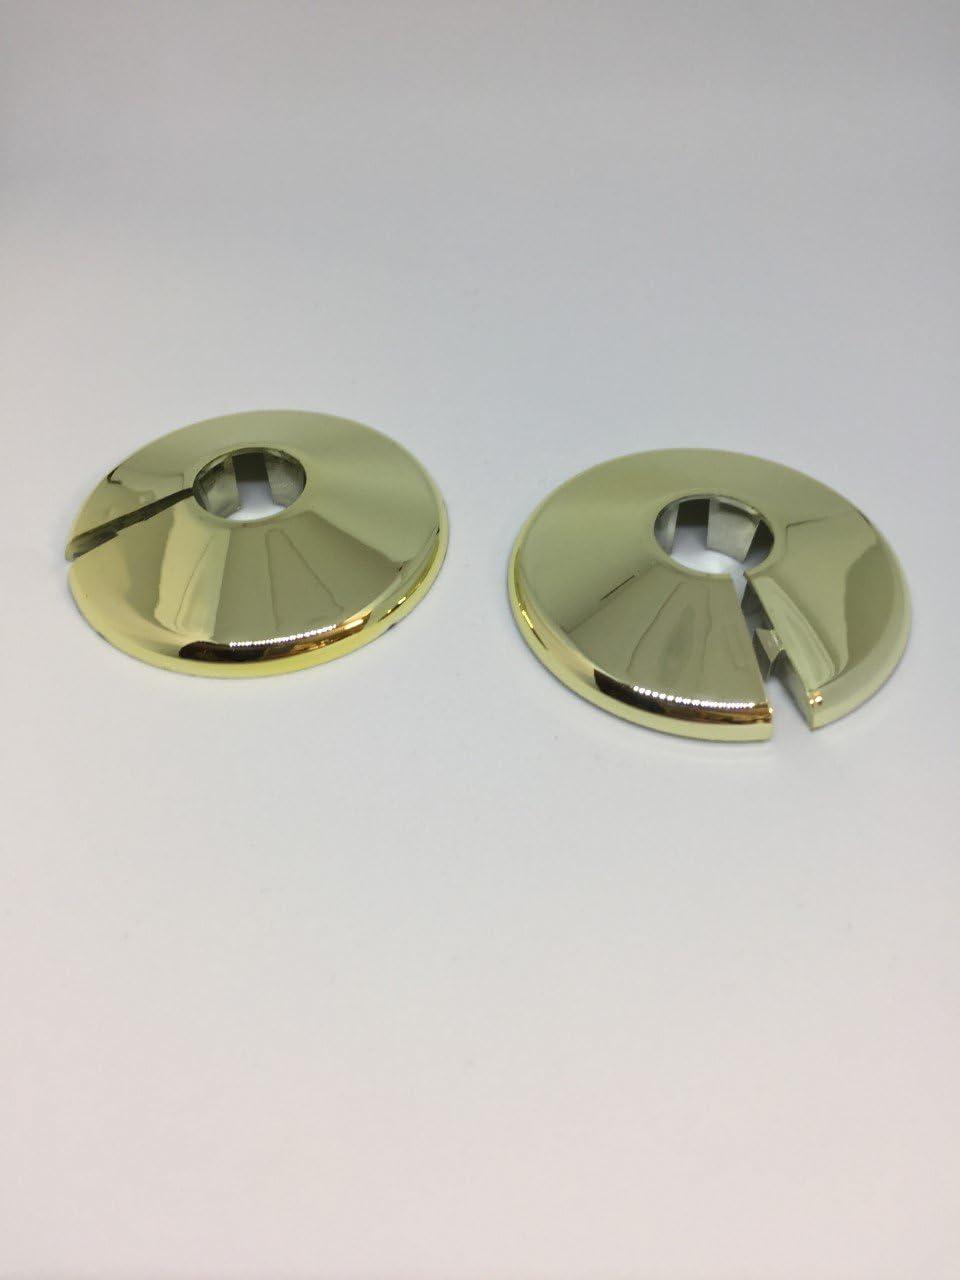 x2 Talon Plastic Gold Pipe Cover for 15mm Pipe